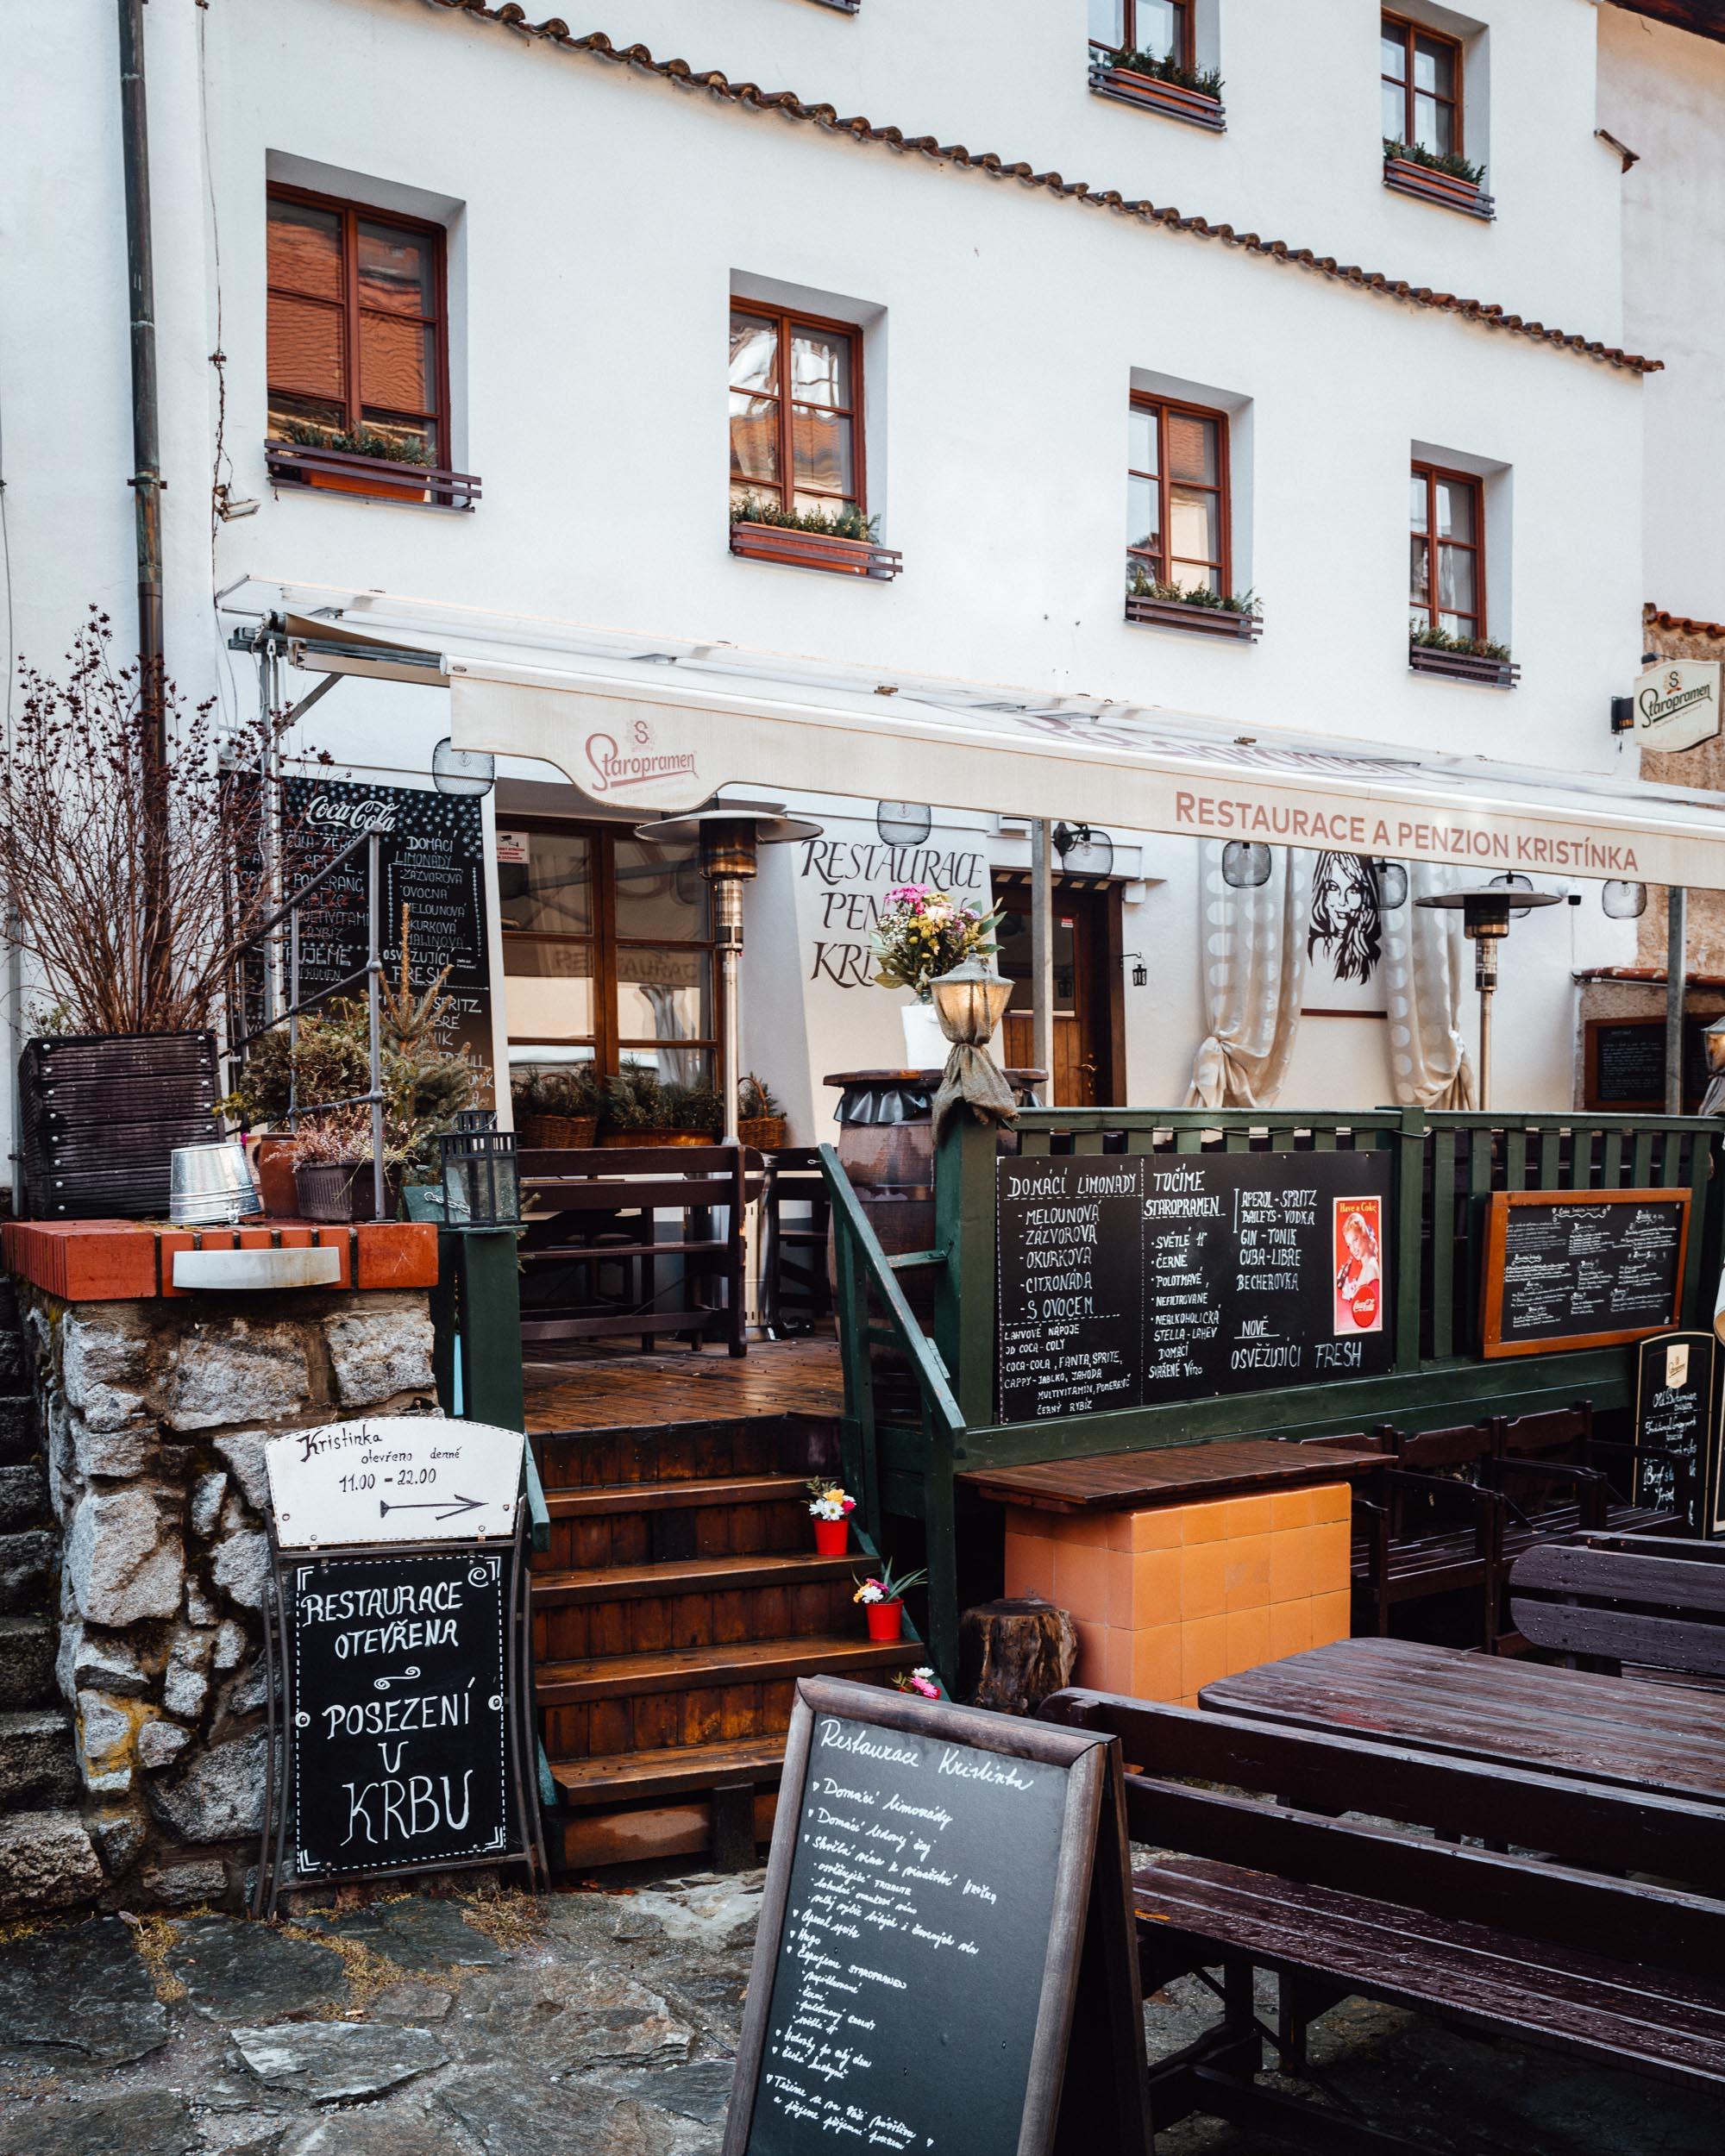 Cafe in Cesky Krumlov